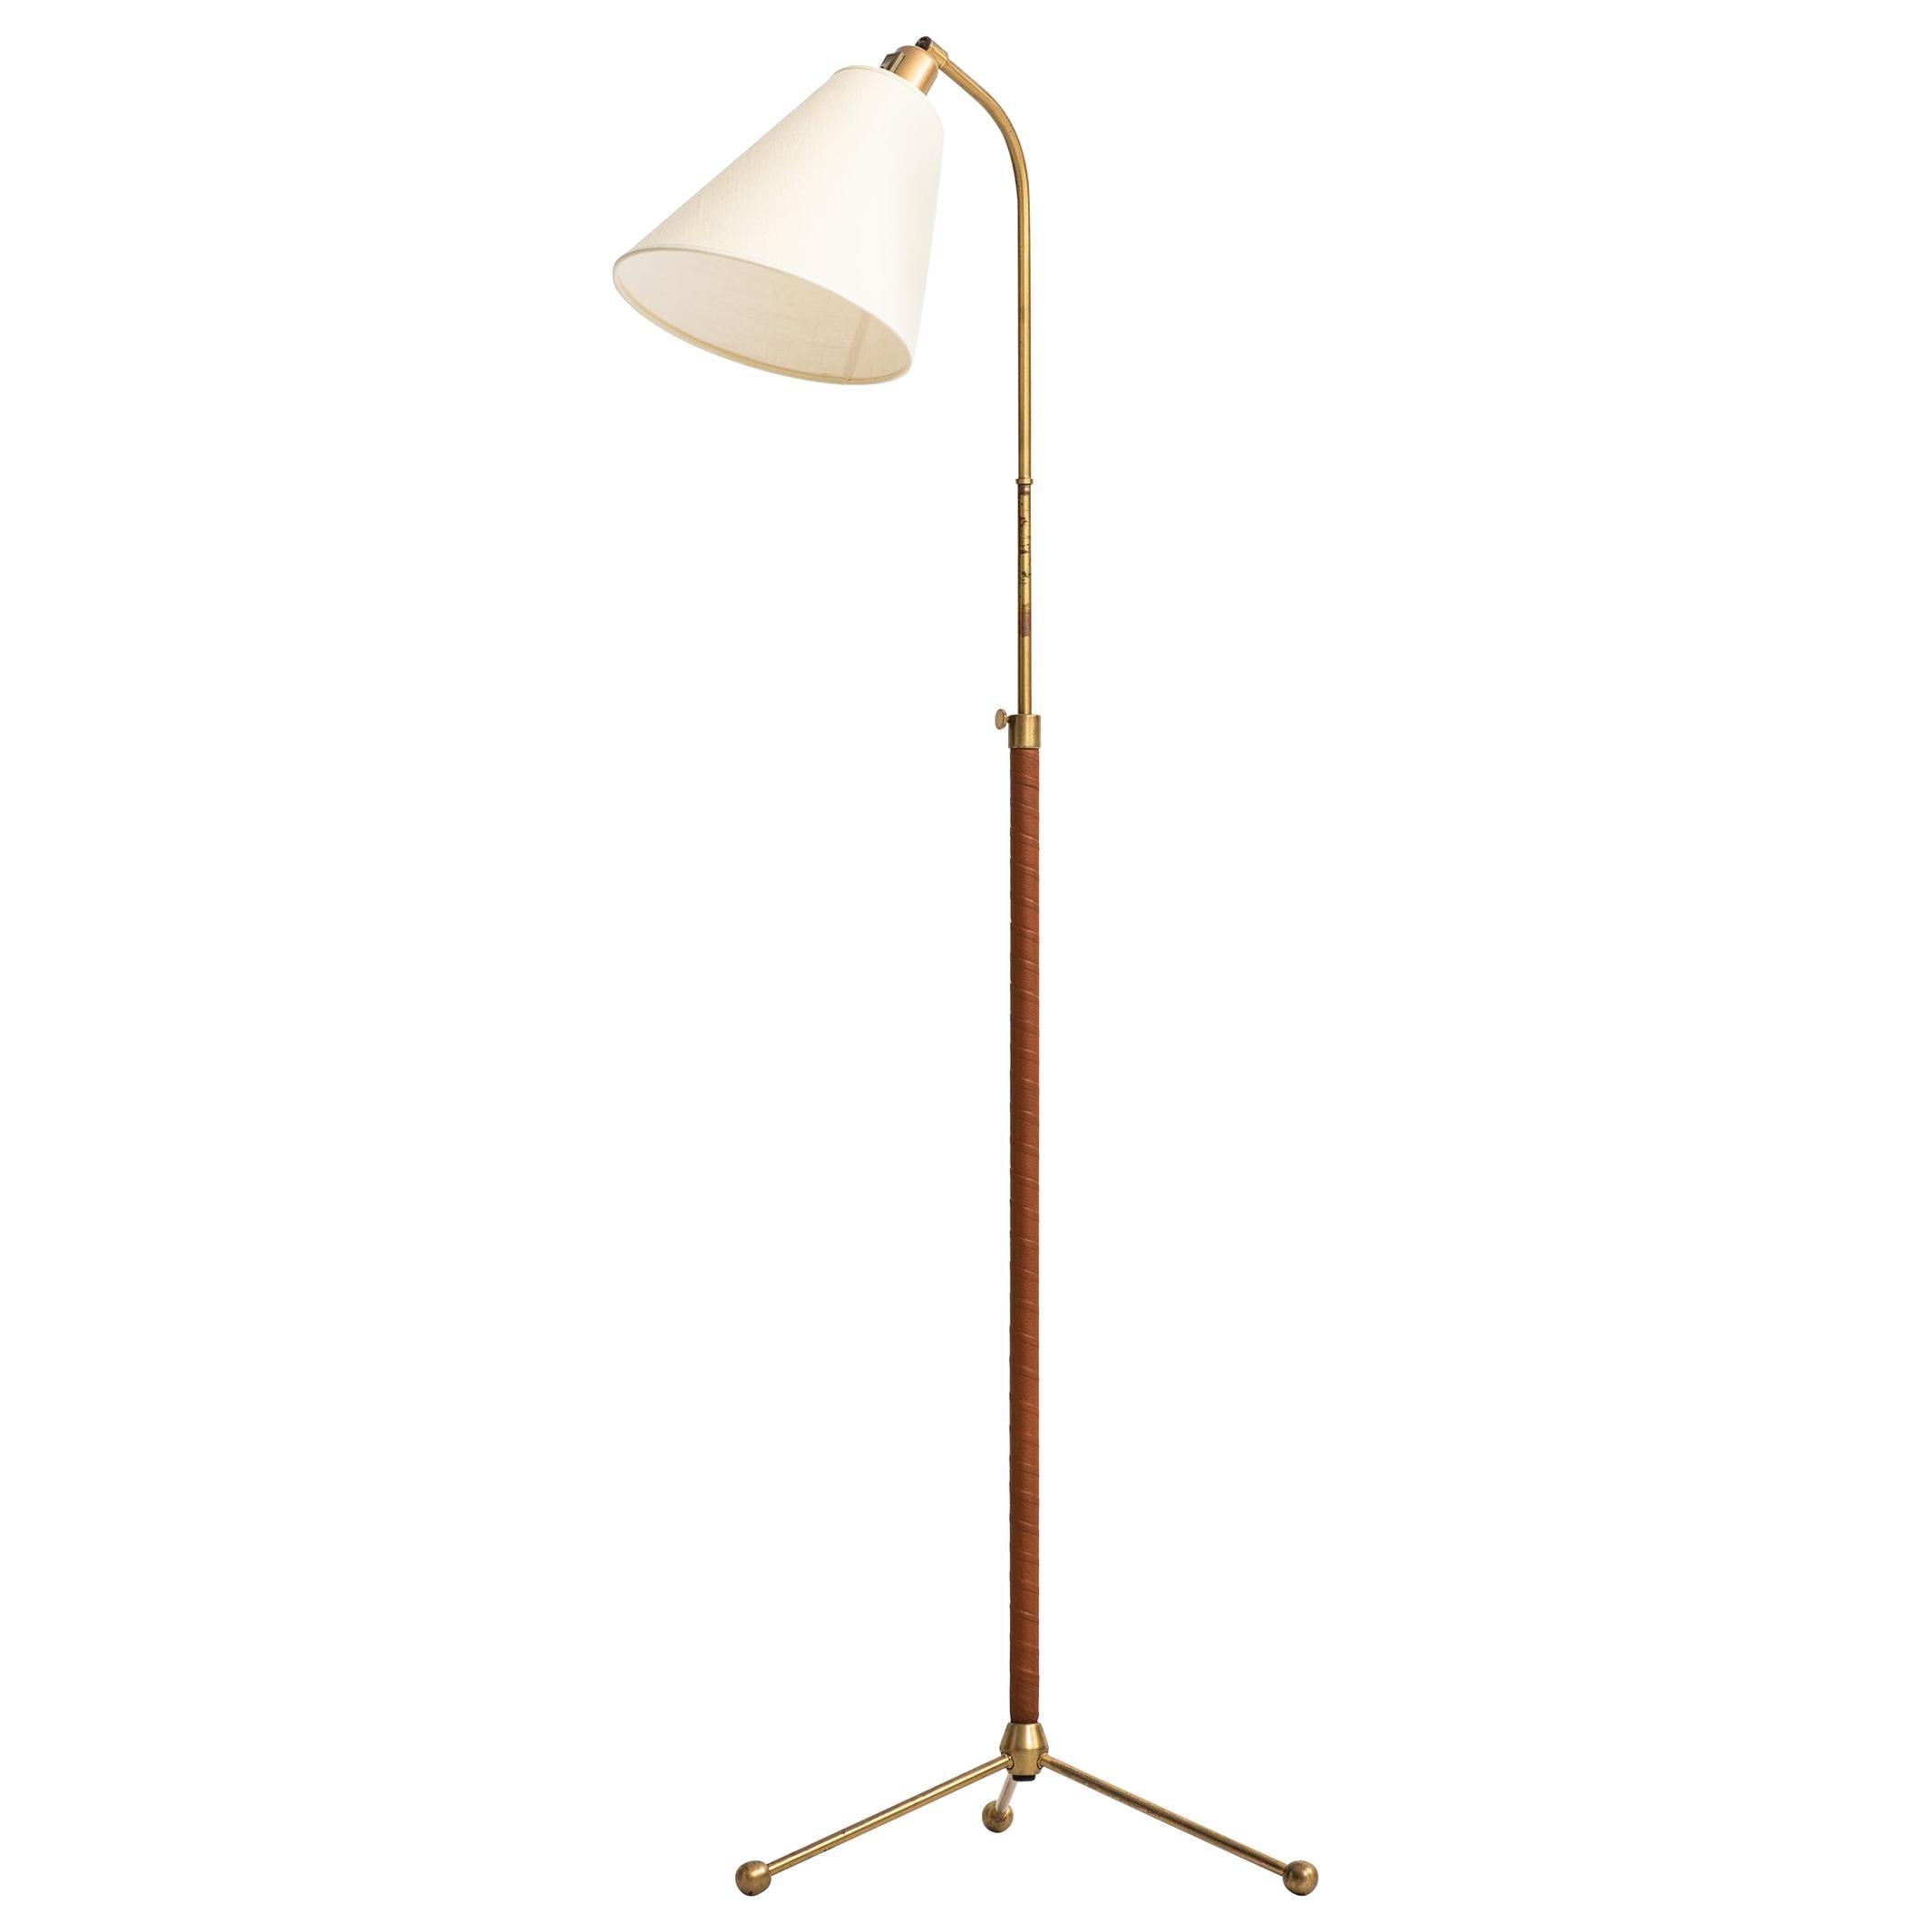 Hans Bergström Floor Lamp Model 545 by Ateljé Lyktan in Åhus, Sweden